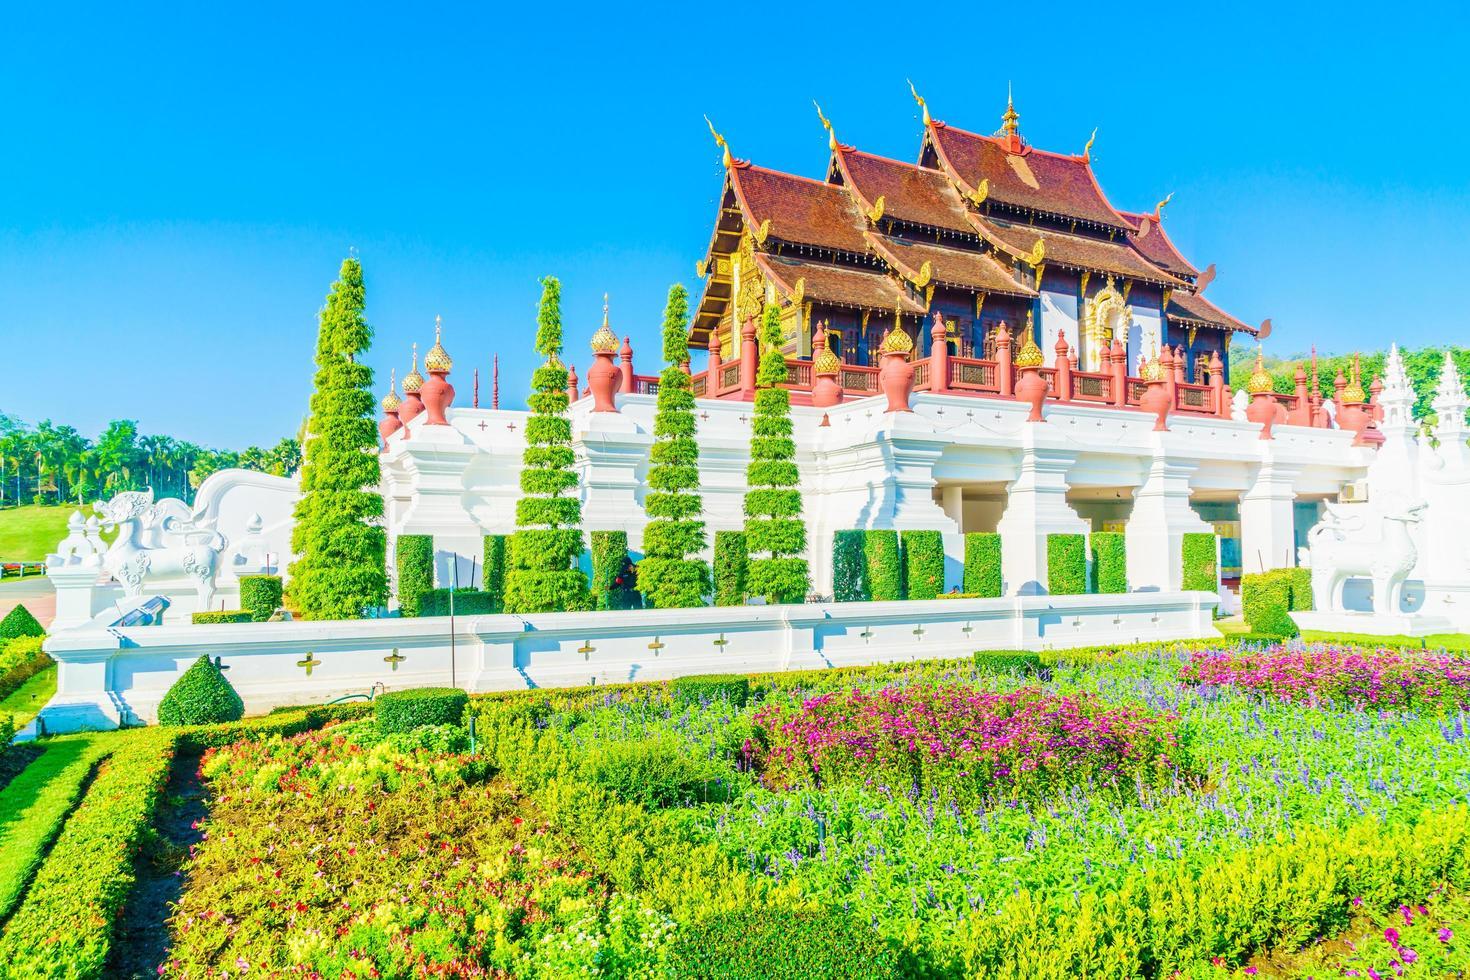 koninklijk paviljoen in chaing mai, thailand foto